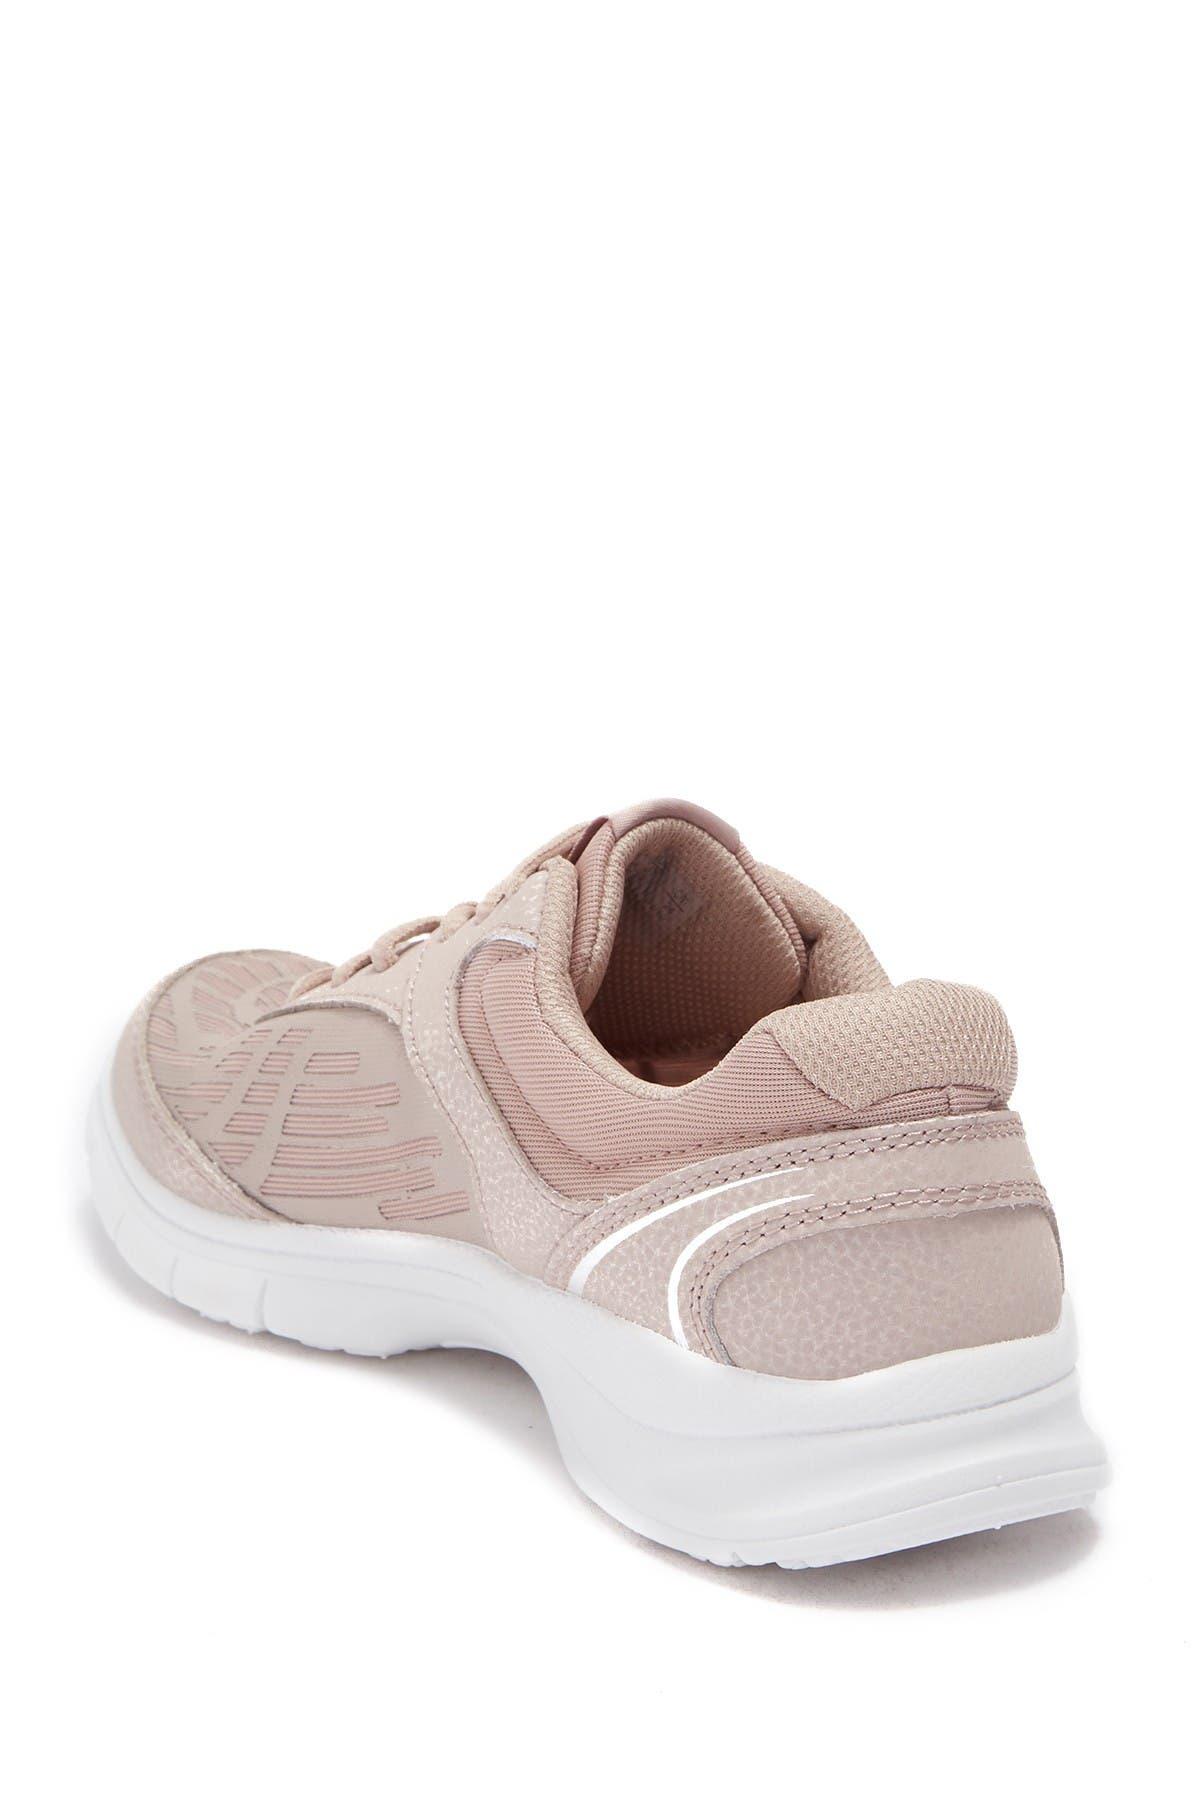 Ryka | Rae 2 Walking Sneaker